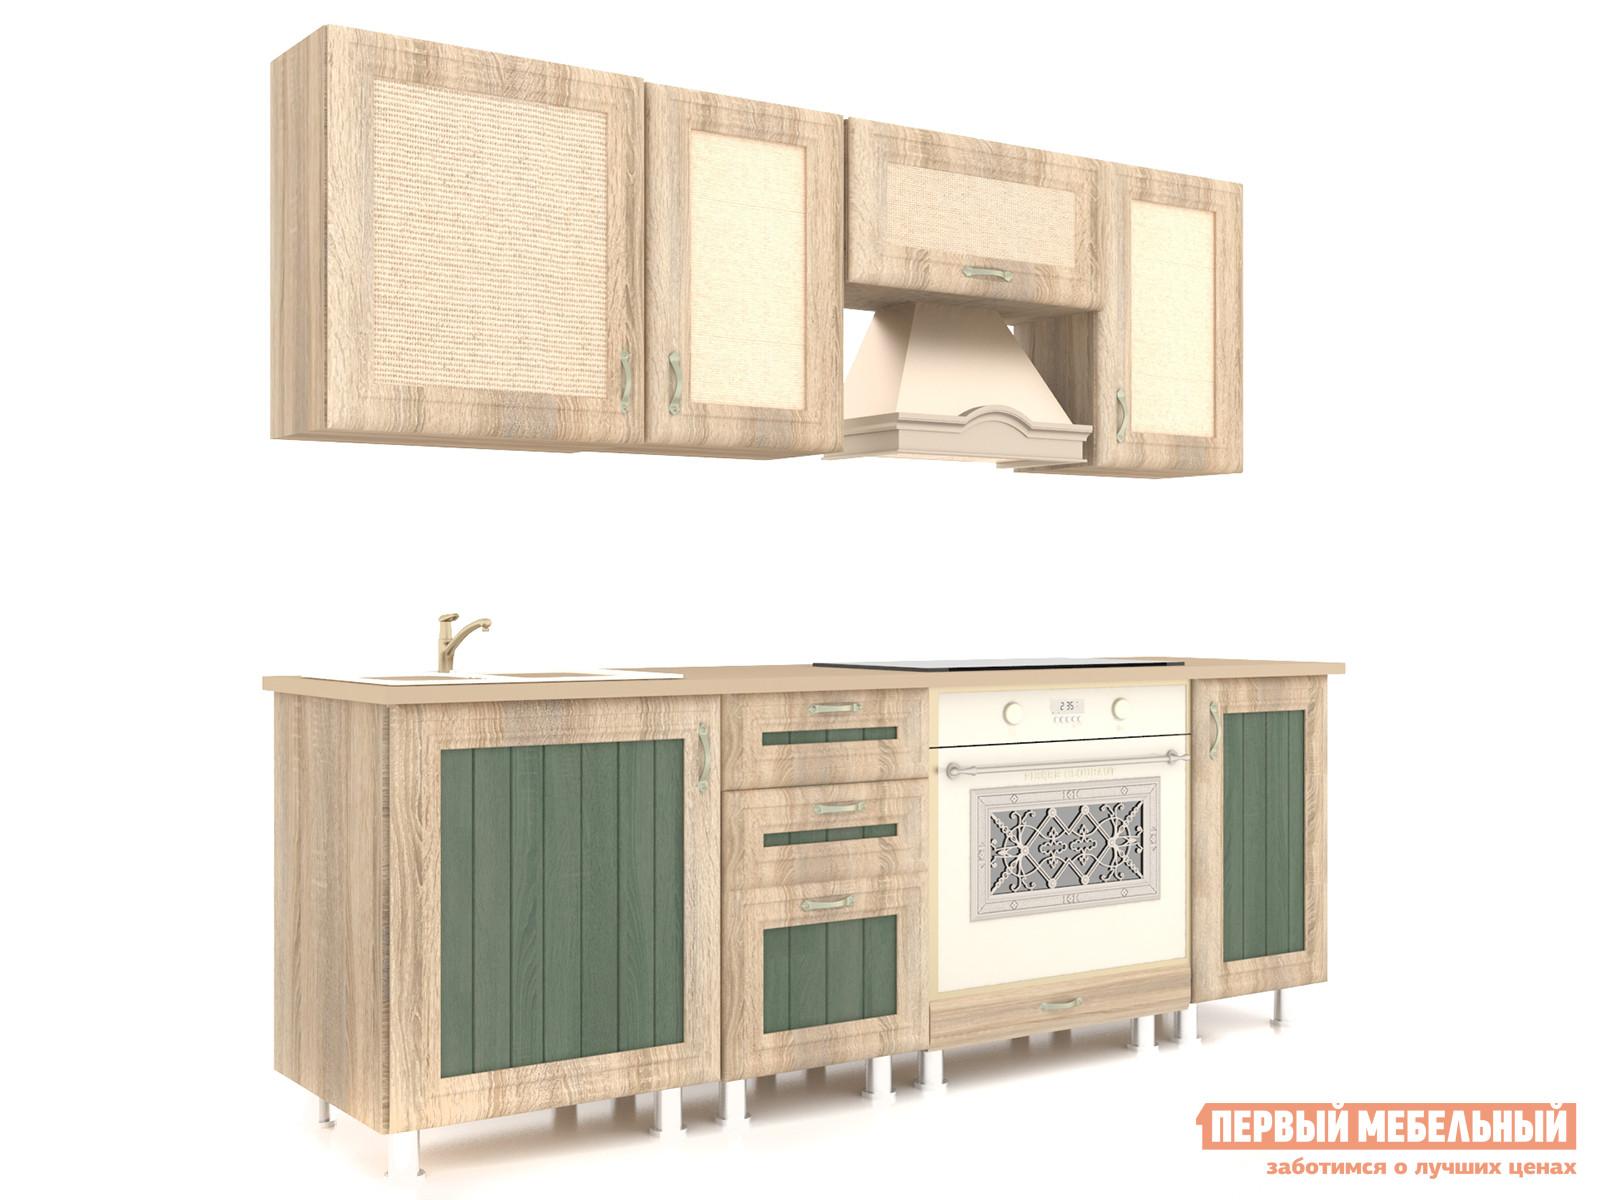 Кухонный гарнитур Любимый дом Кантри 200 см Сонома любимый дом кухонный гарнитур анастасия